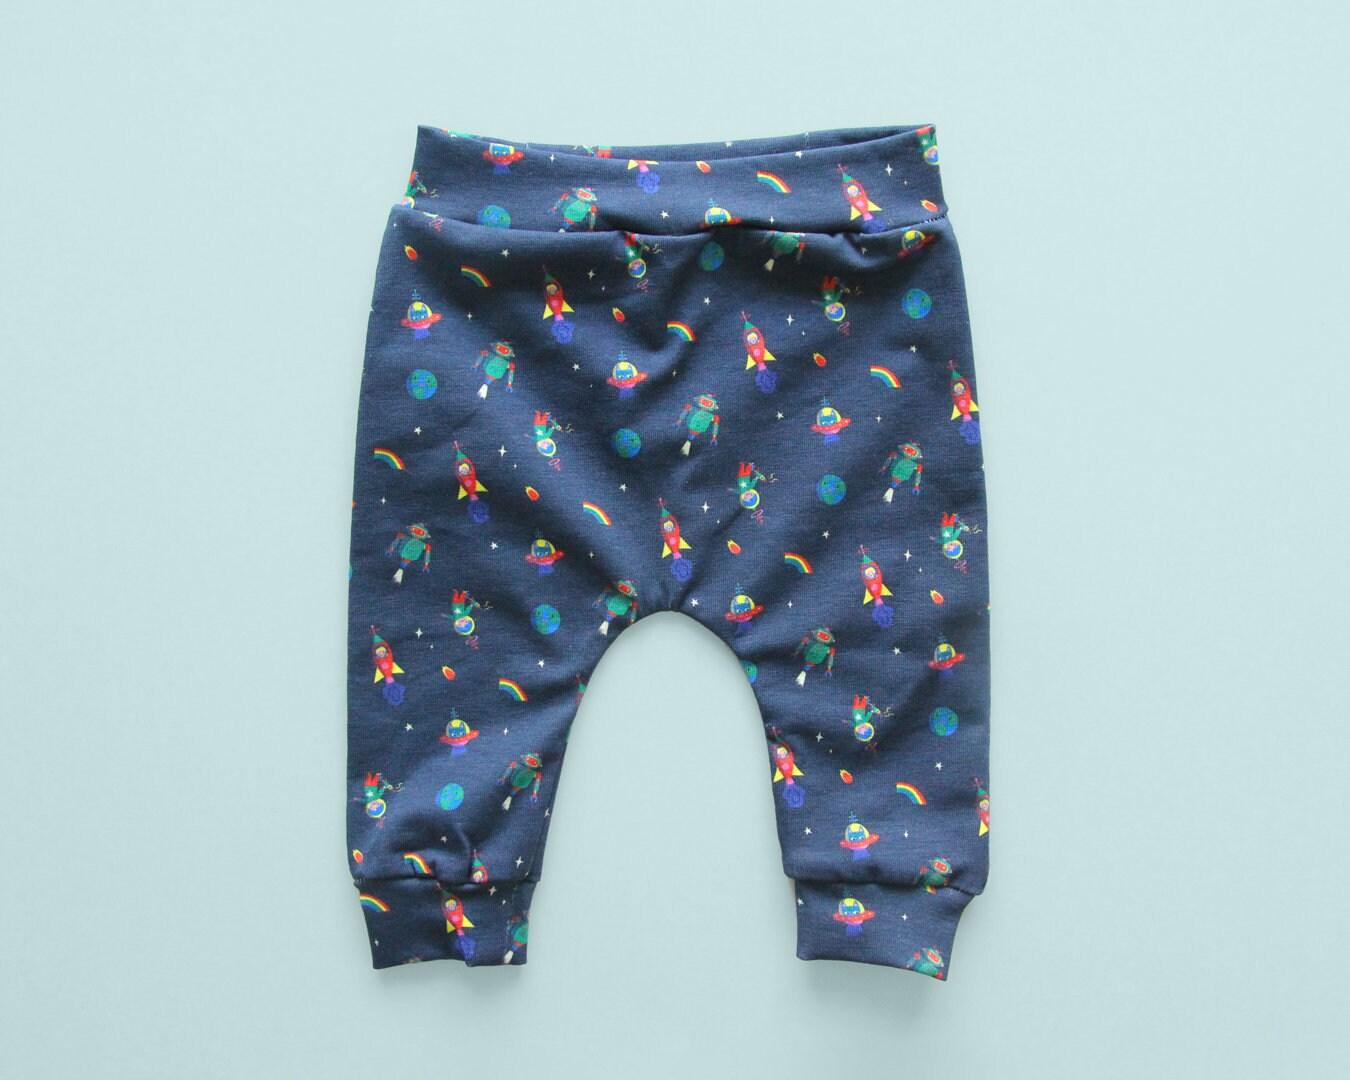 bd6404c81d00b9 Baby pants Newborn baby present baby legging baby pants boy | Etsy